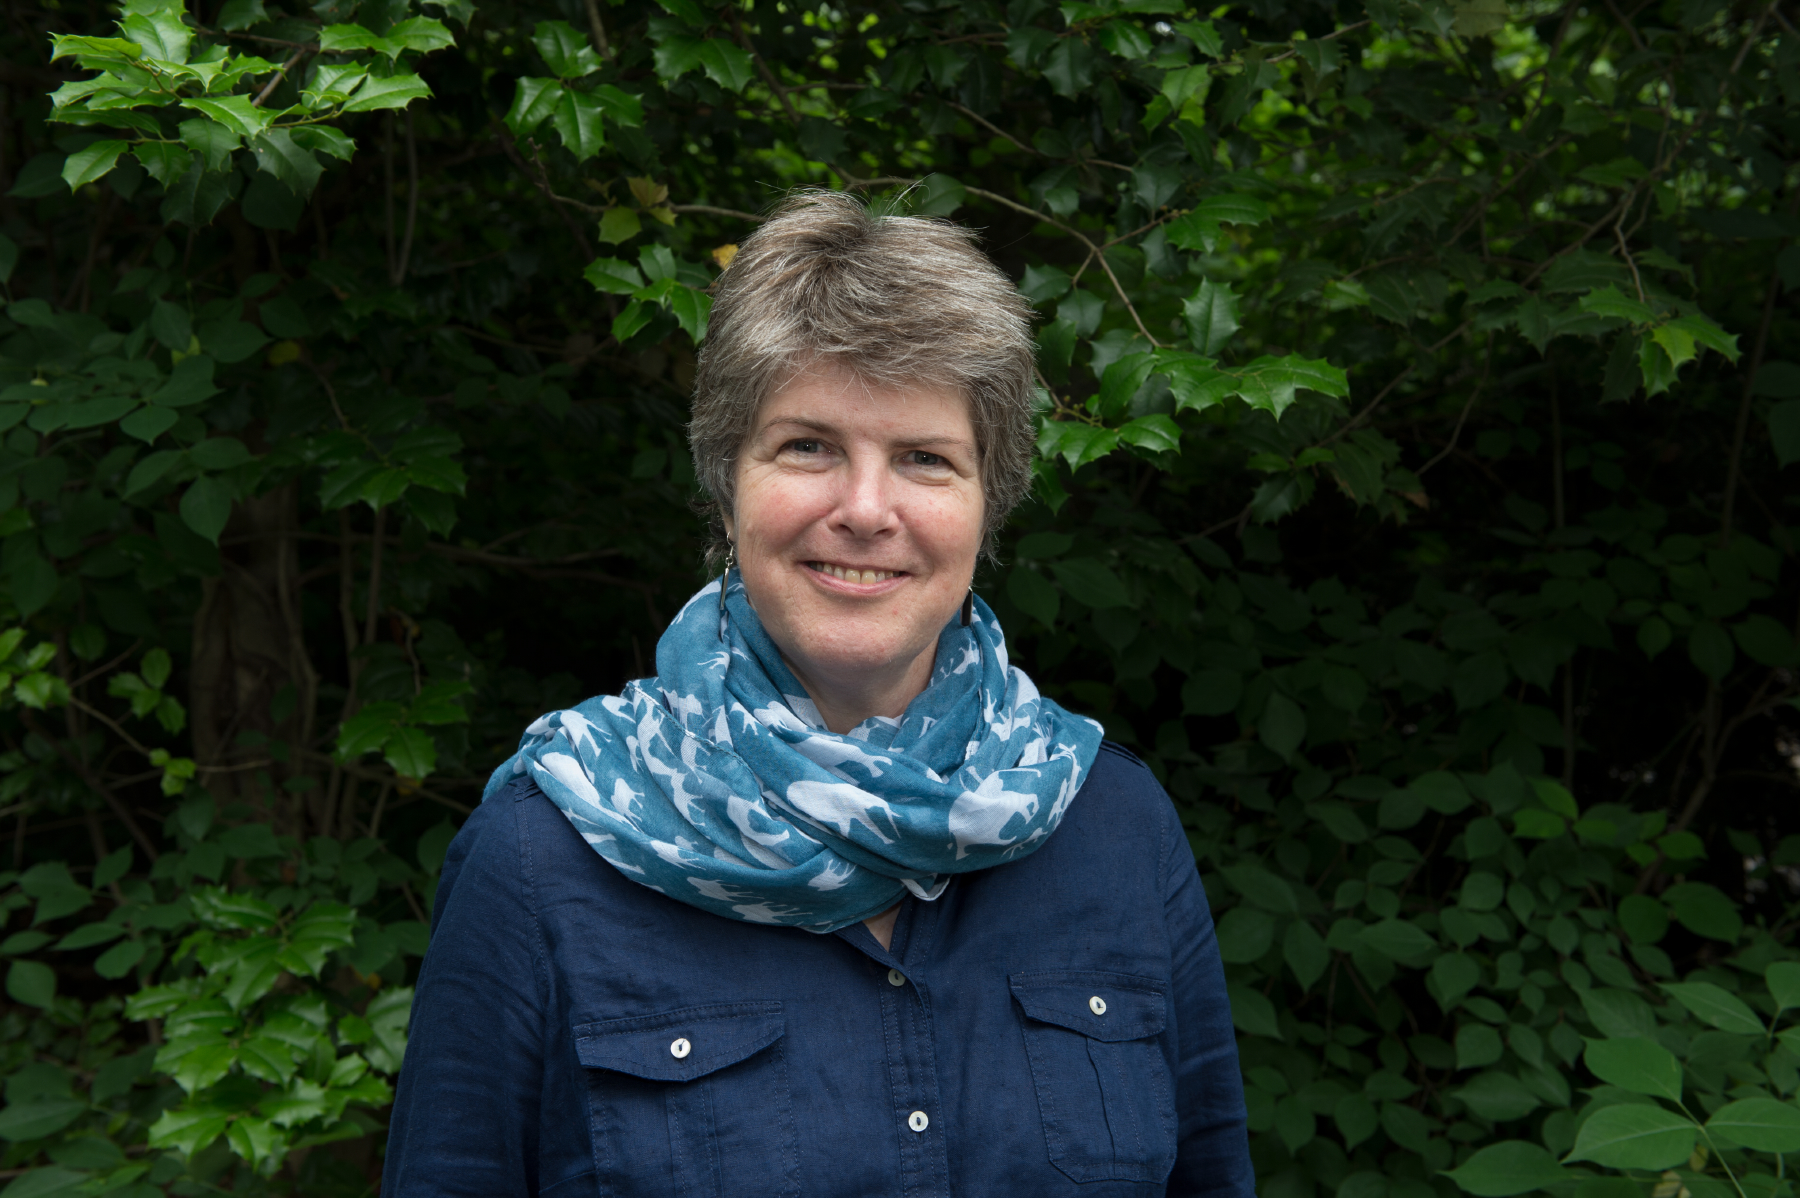 Fiona Maisels